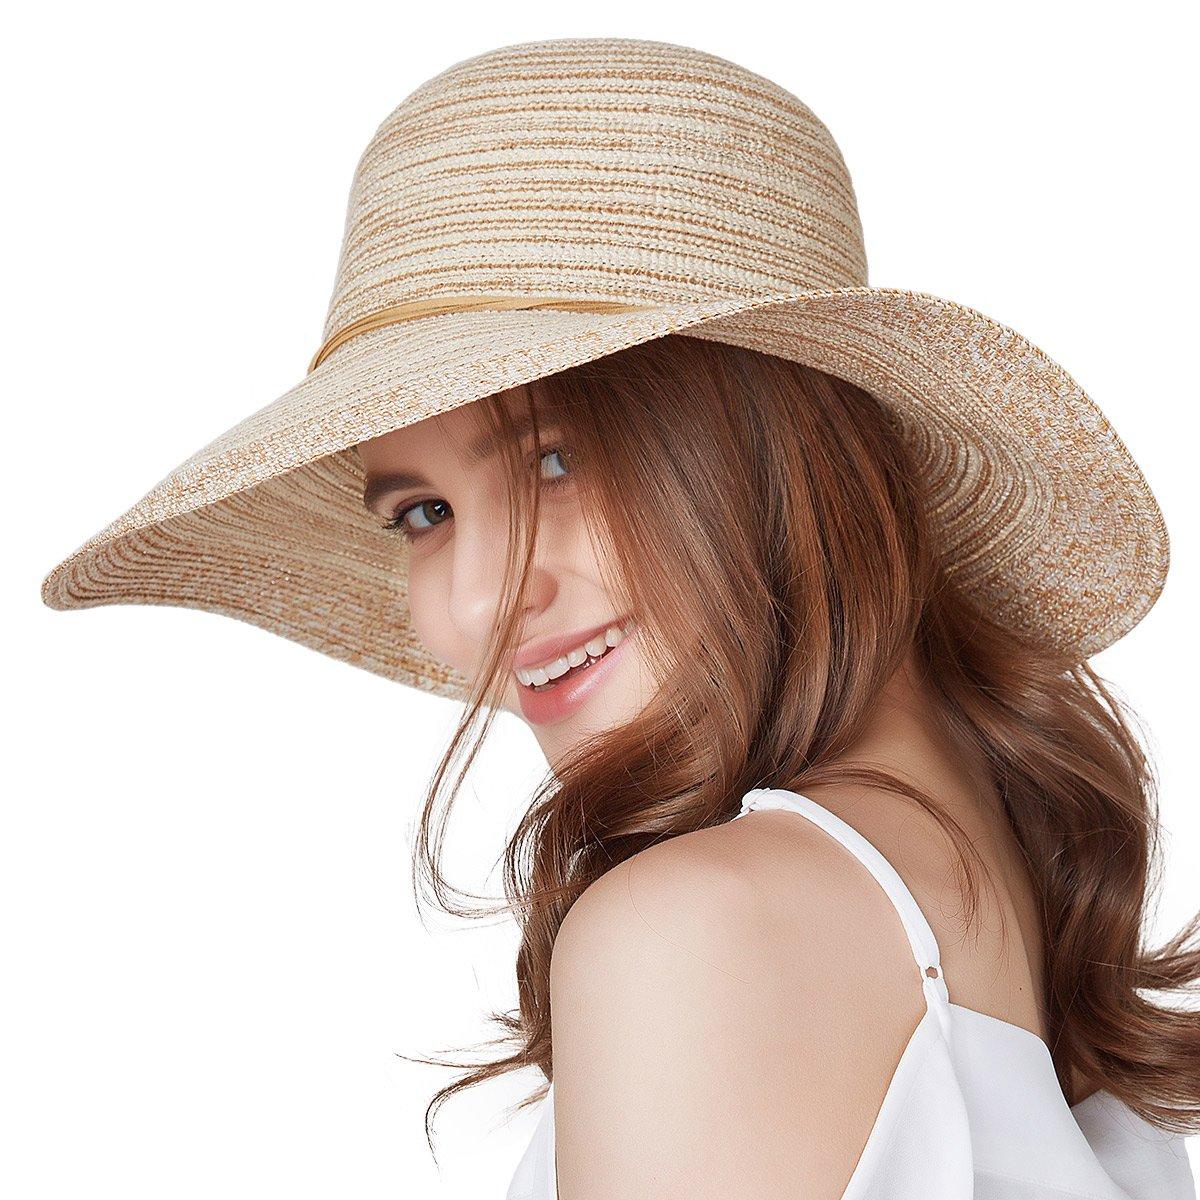 24bf0ad08c895 SOMALER Women Floppy Sun Hat Summer Wide Brim Beach Cap Packable Cotton Straw  Hat for Travel Beige at Amazon Women s Clothing store